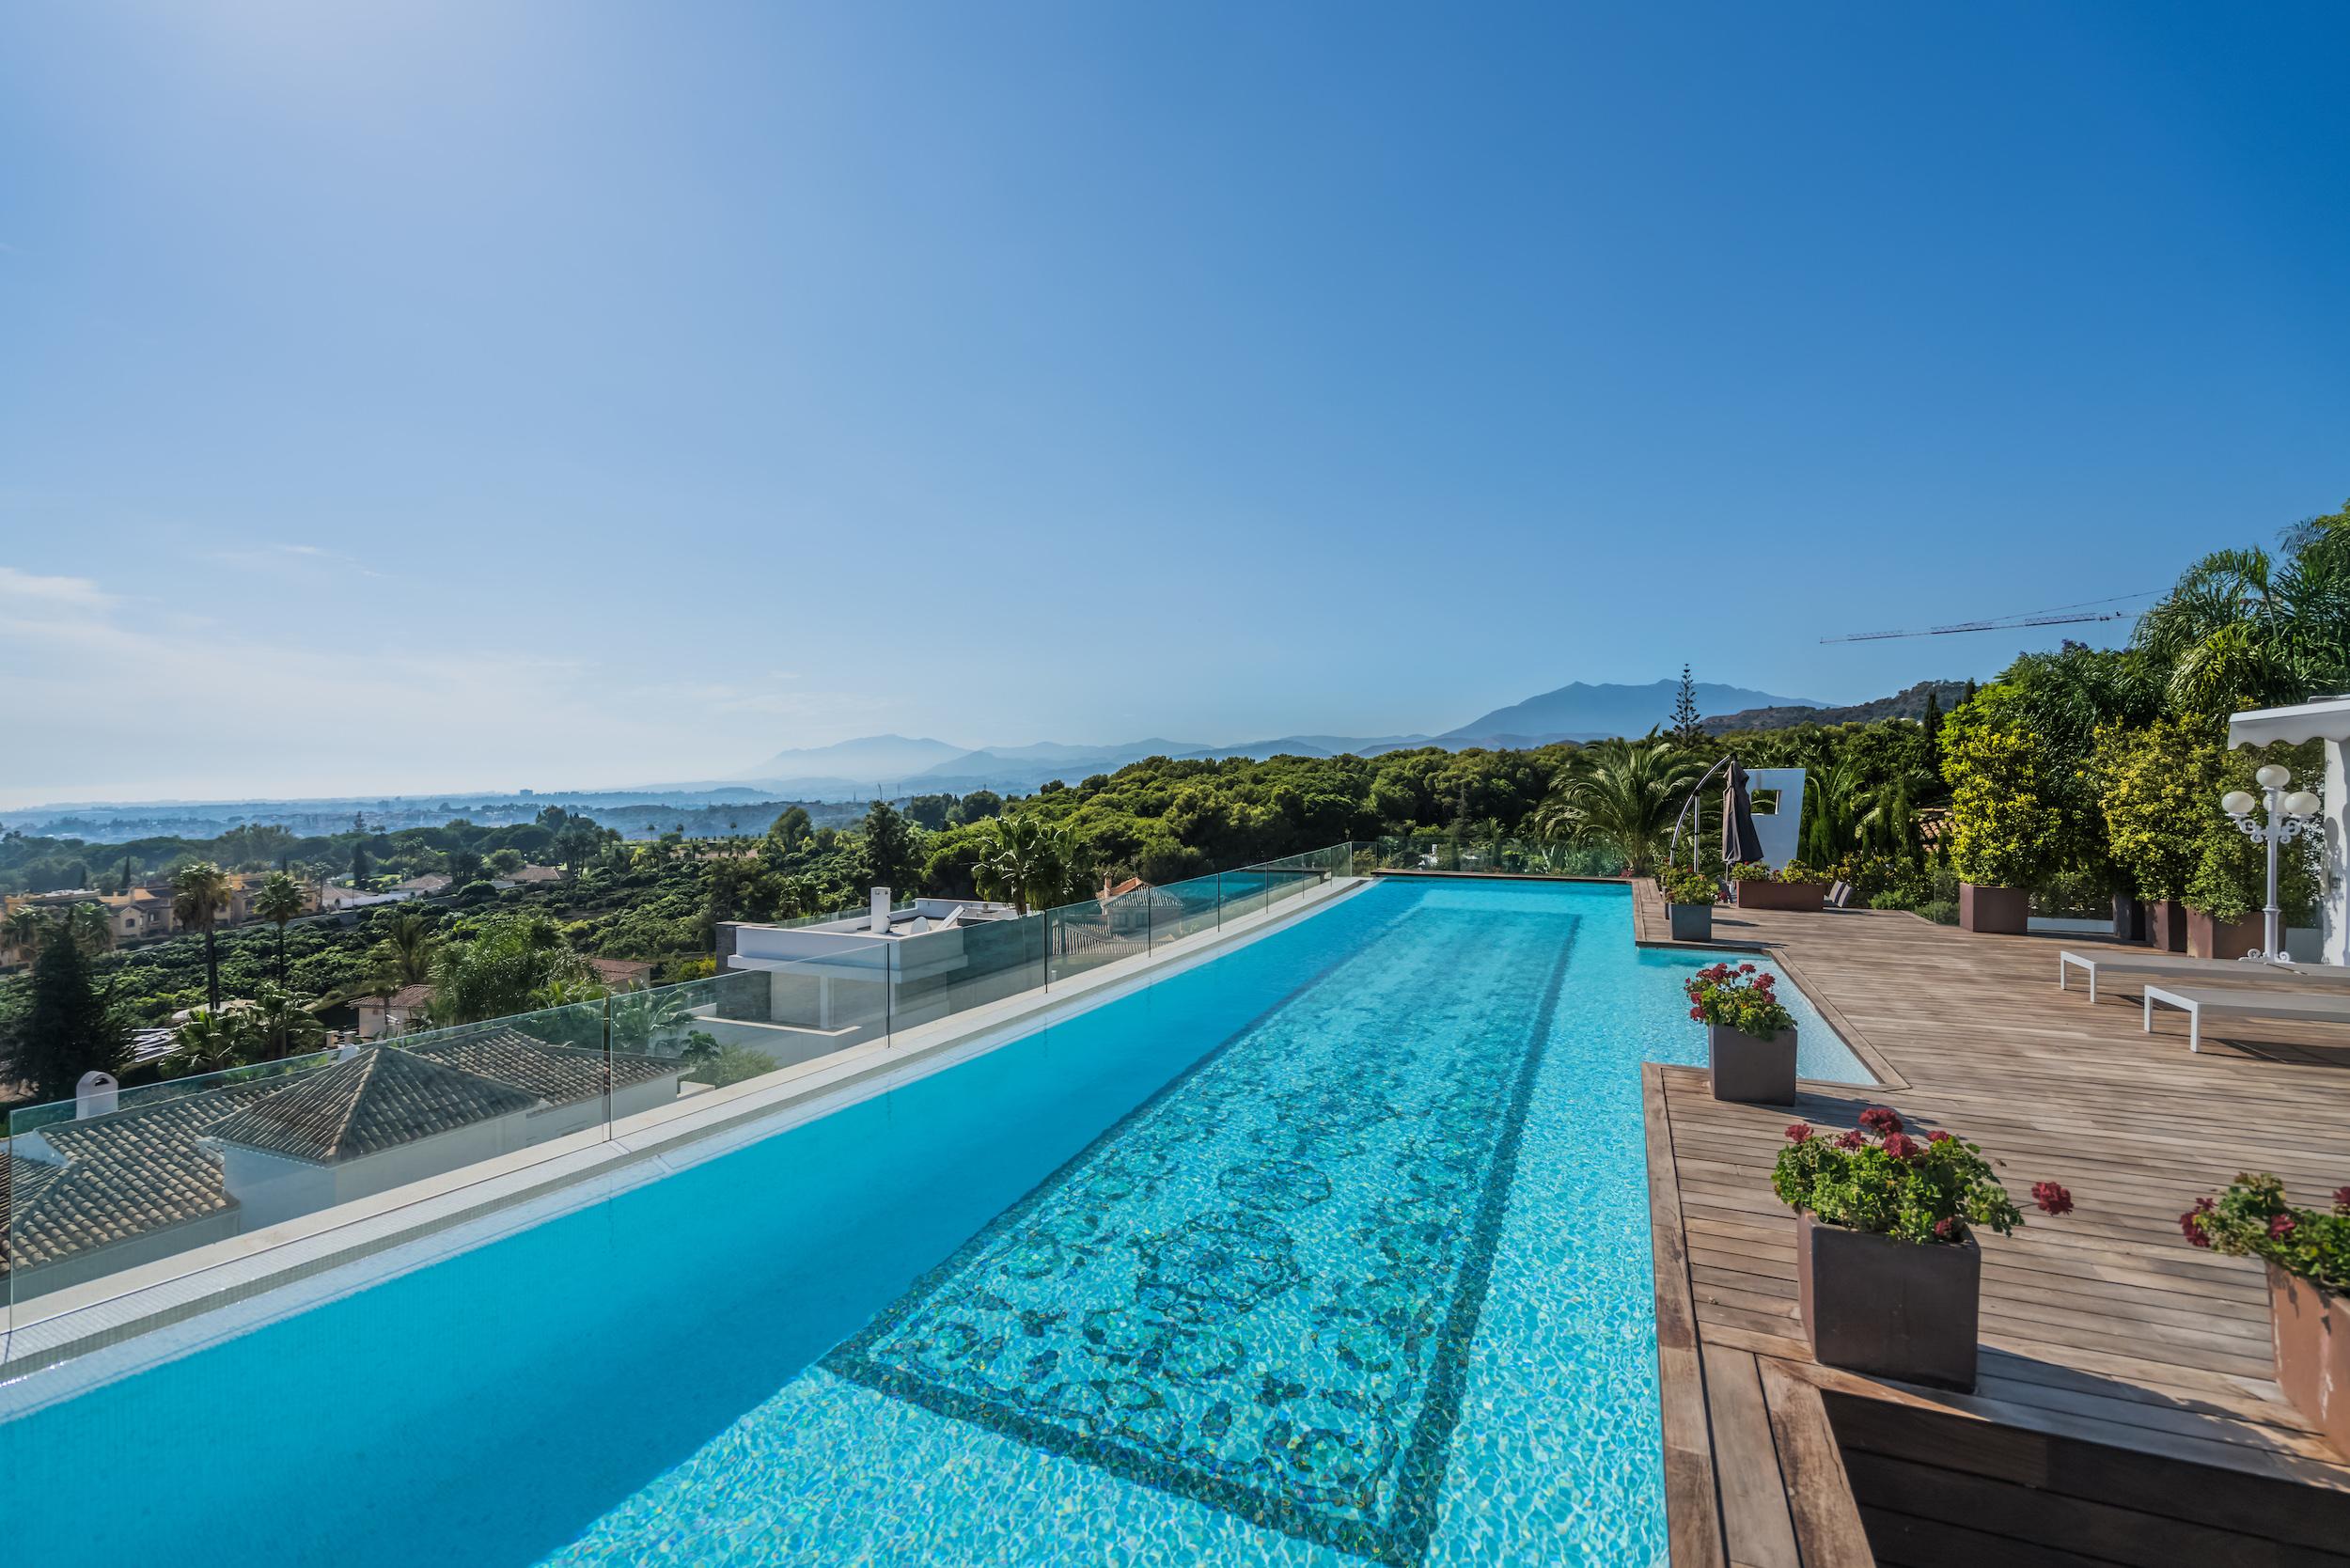 Swimming pool penthouse view in Reserva de Sierra Blanca